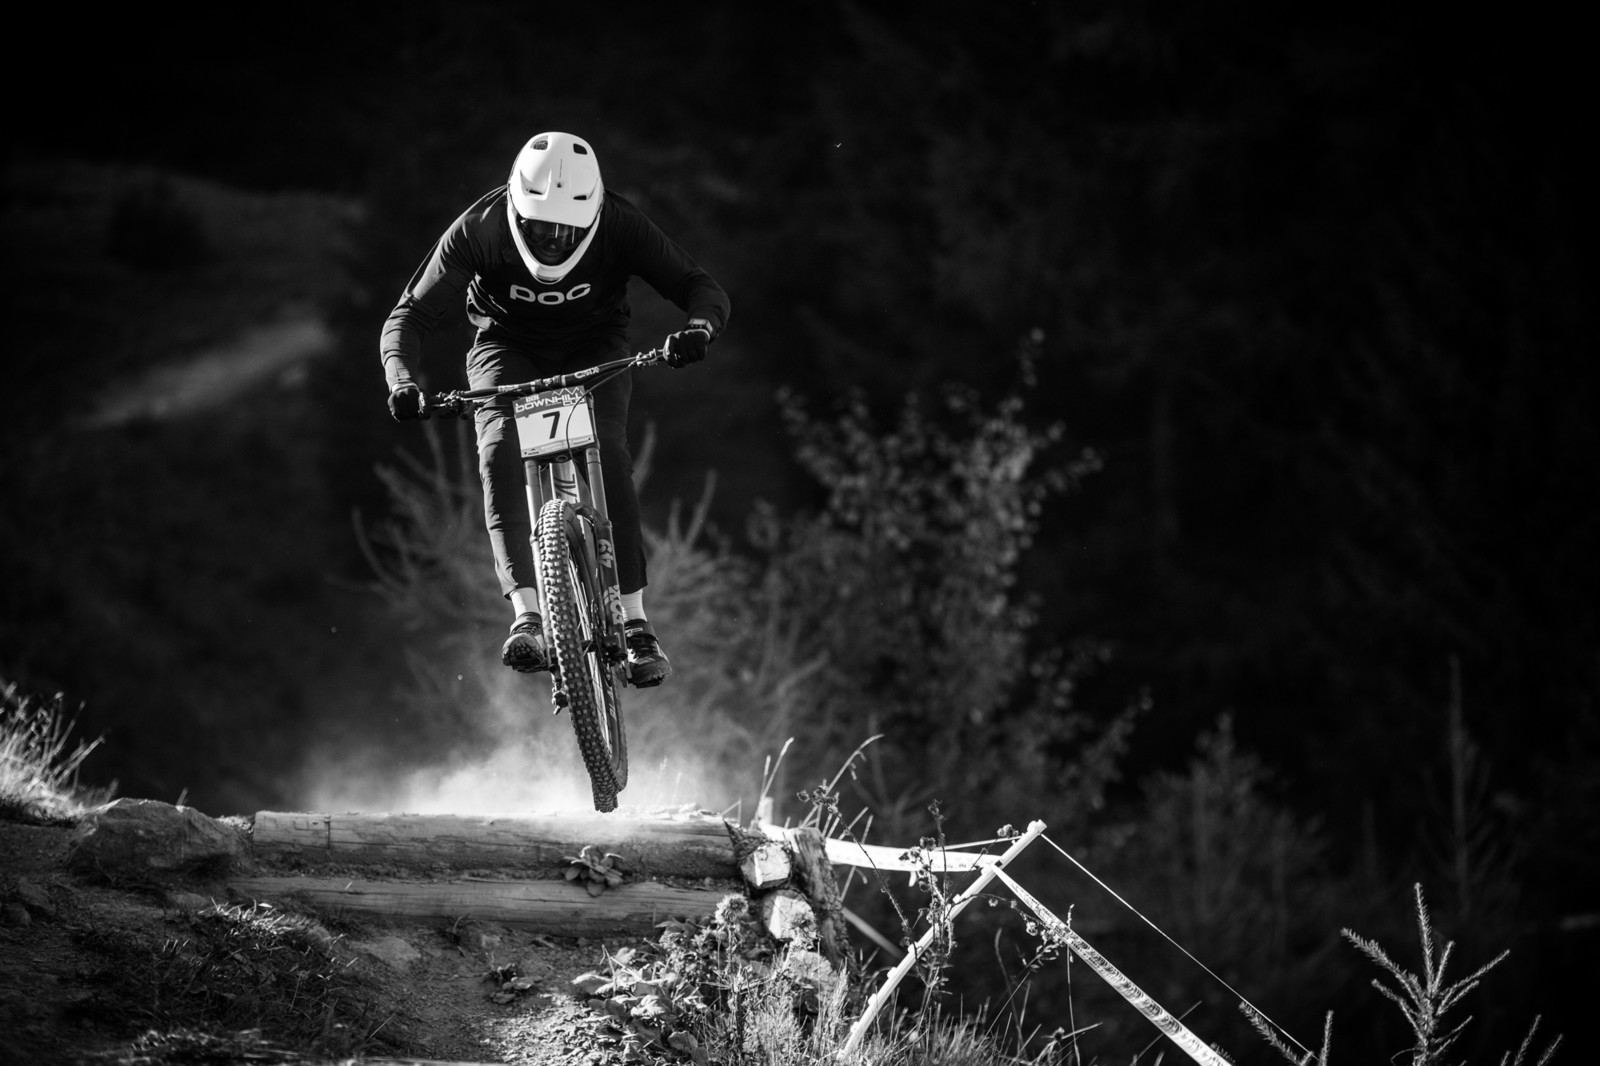 Silas Grandy - 2019 iXS European Downhill Cup Brandnertal - Race Gallery - Mountain Biking Pictures - Vital MTB